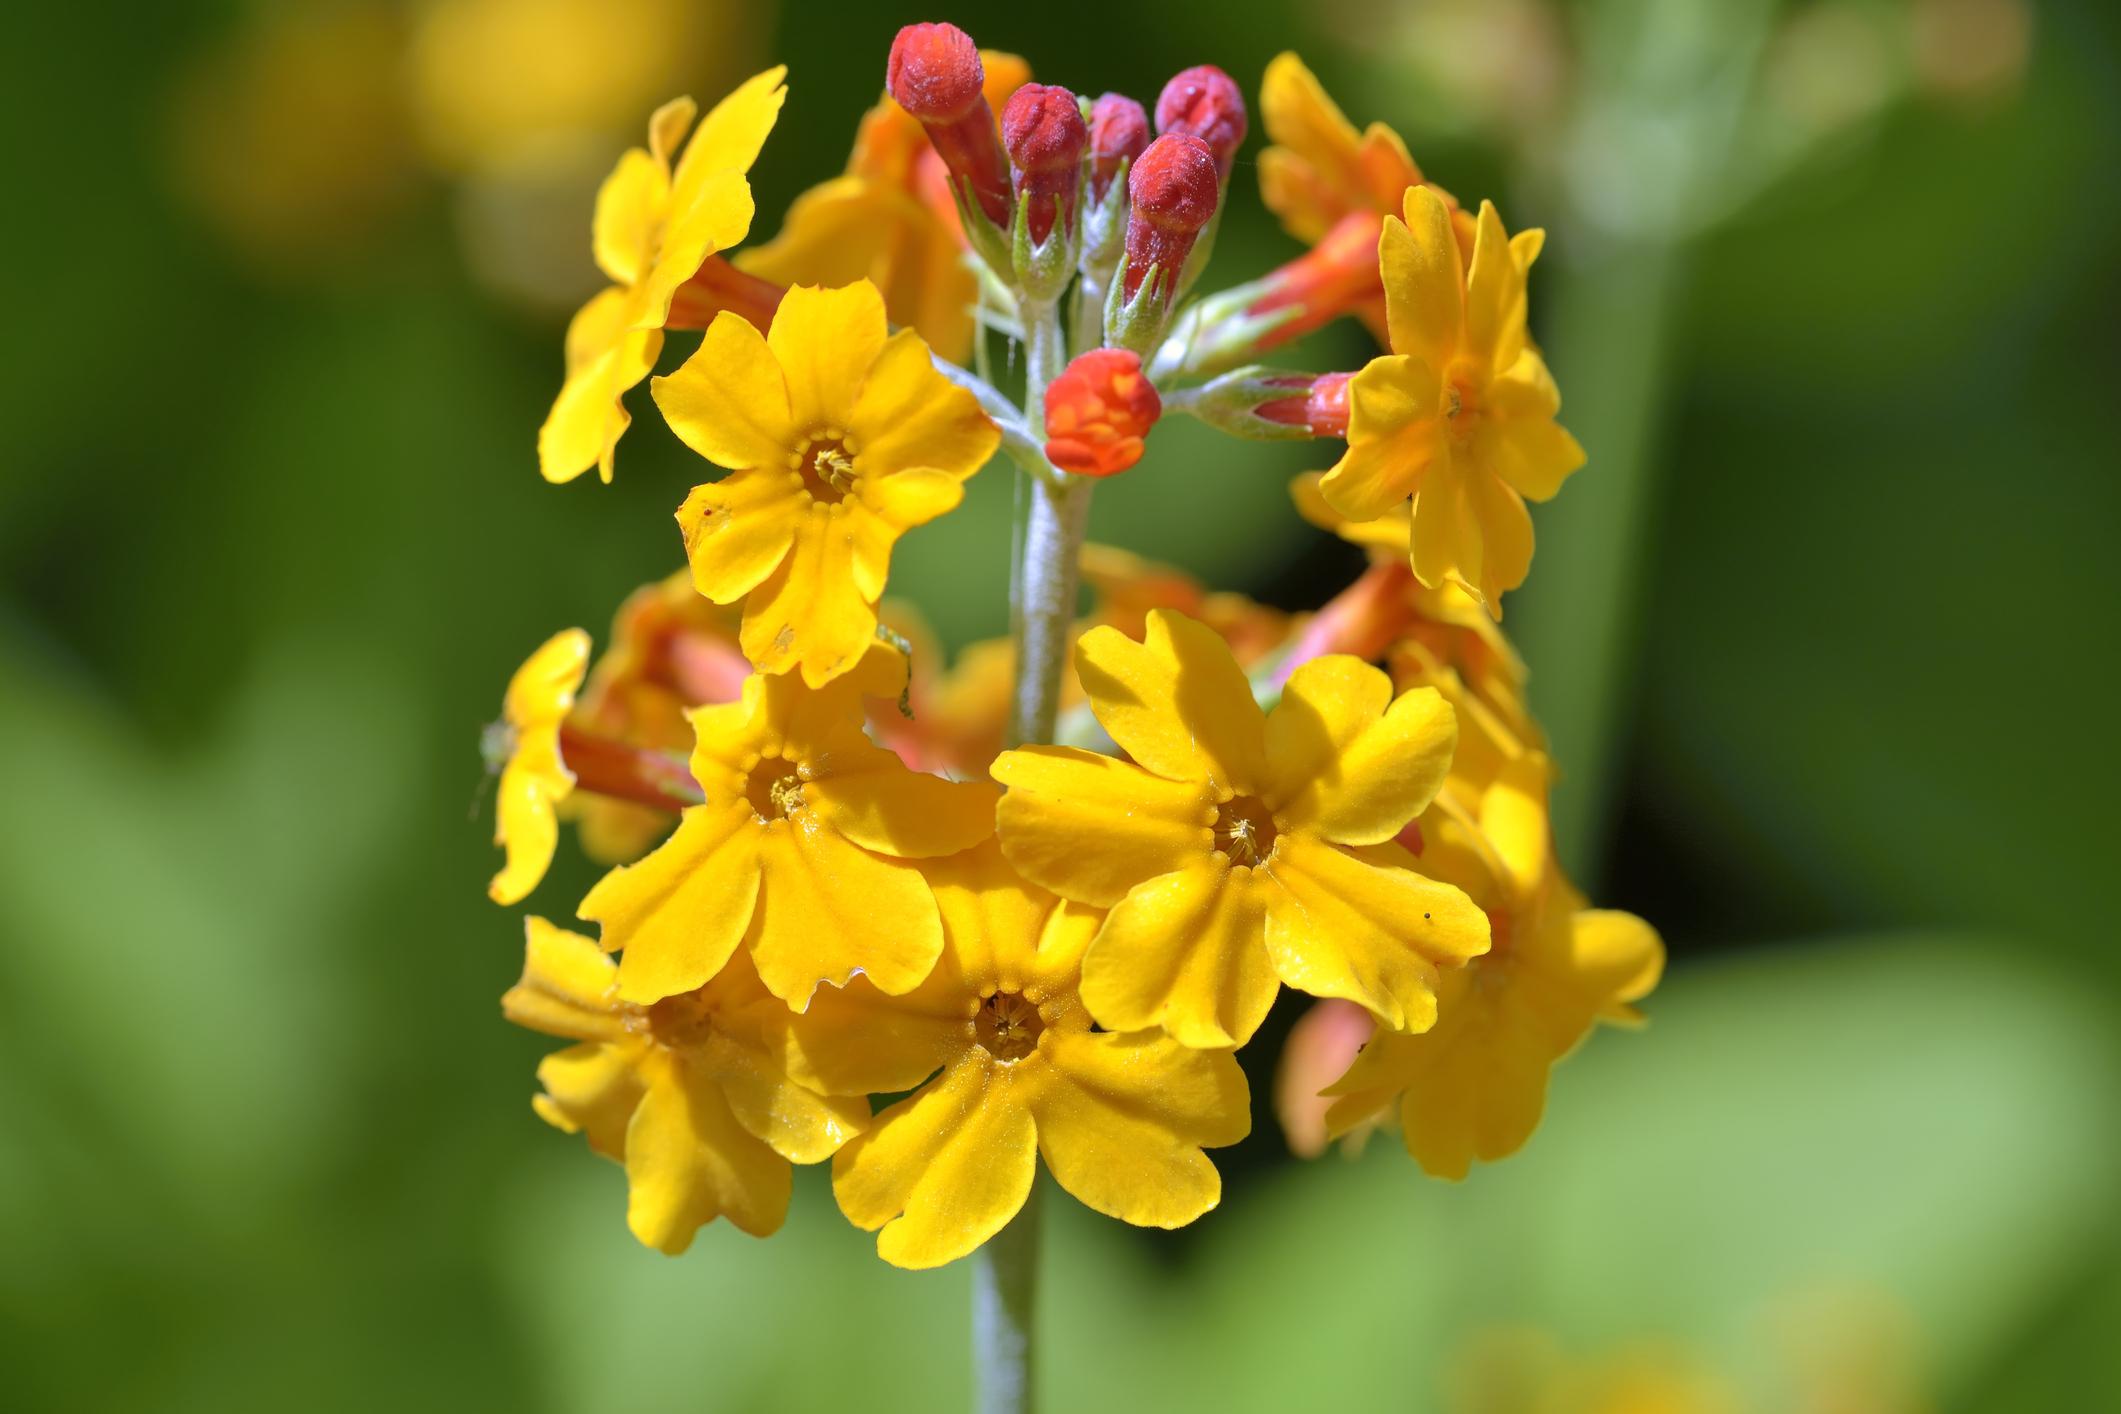 Primrose japonica, Japanese primrose, or Candelabra primrose tolerates wet feet. Combine with cinnamon or ostrich fern for spring display.